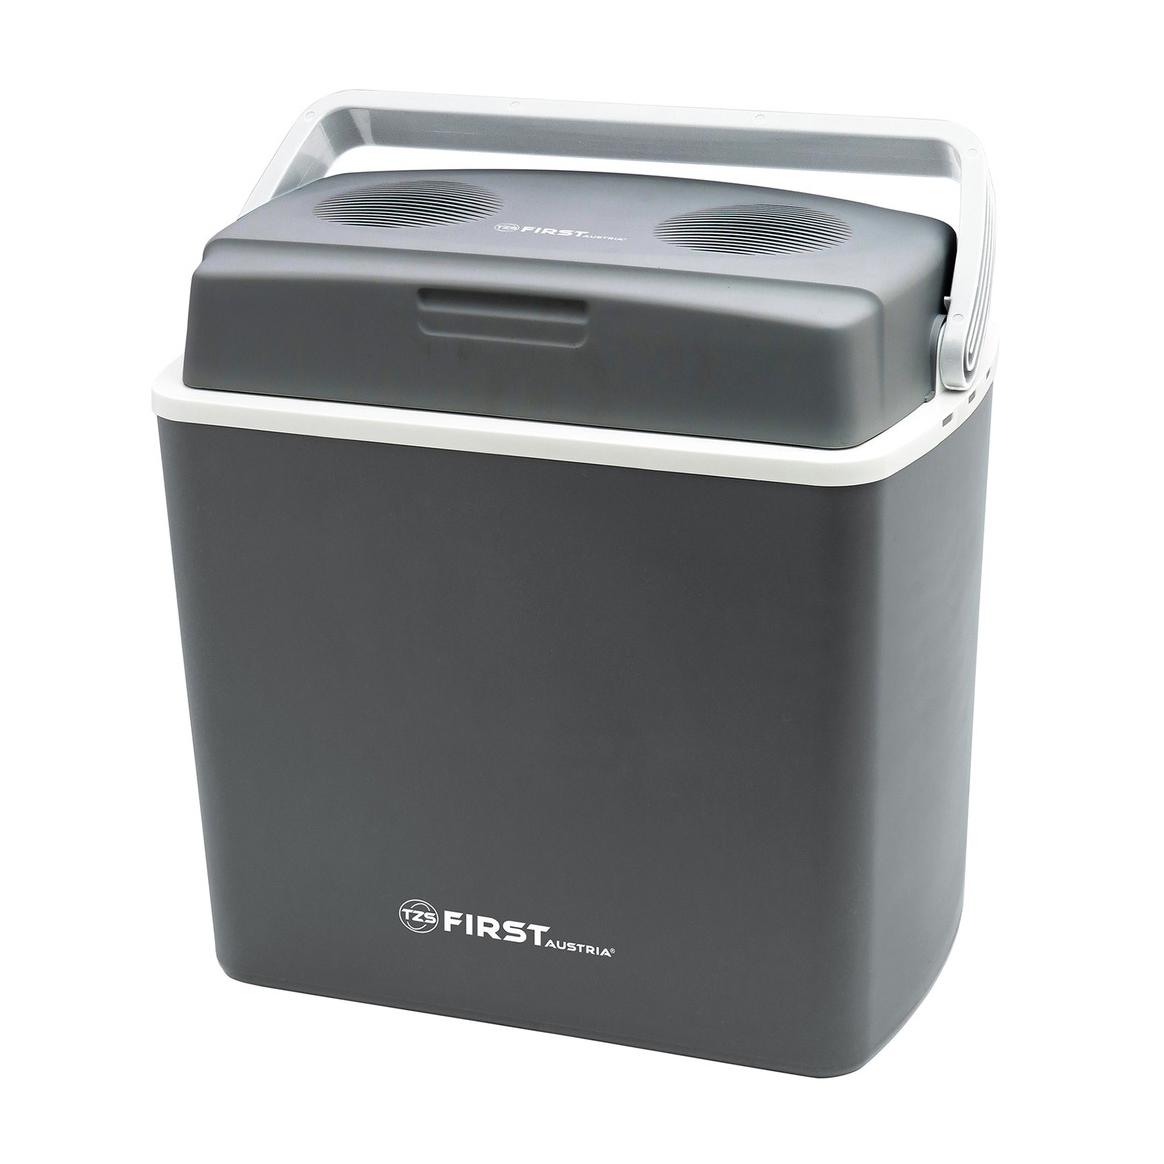 Автохолодильник First FA-5170-3 Grey 22 л first fa 5458 brown кофеварка